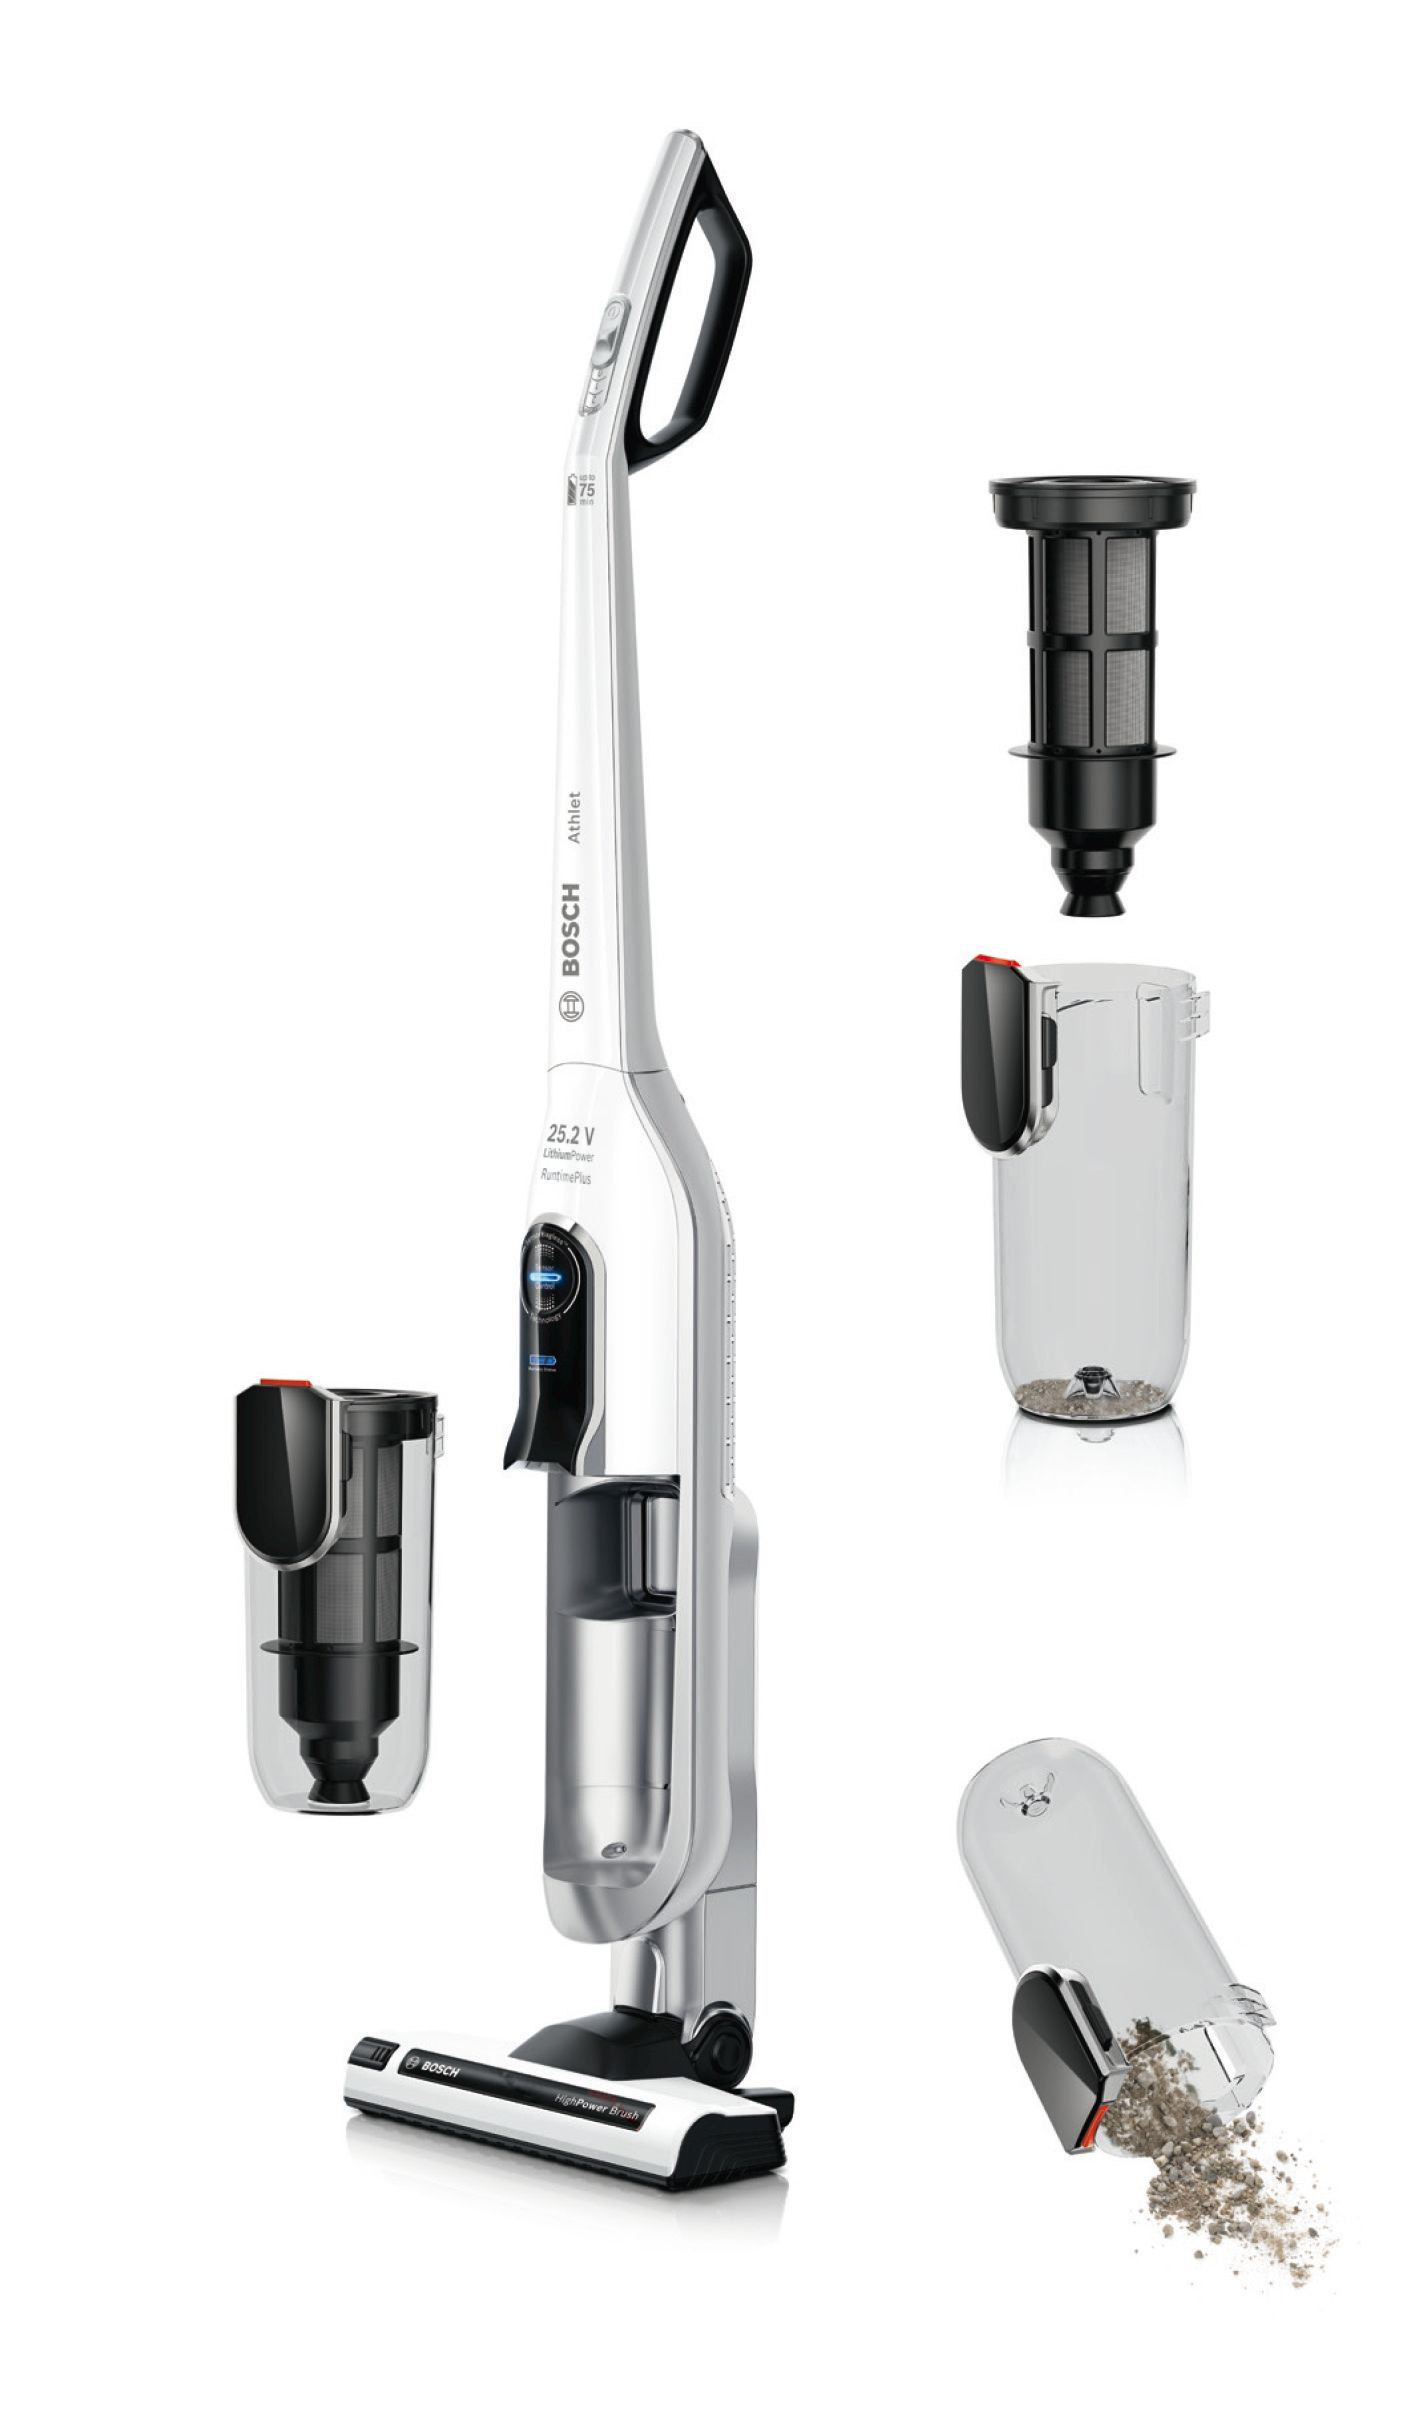 Akumulatorski usisivač Bosch Athlet RuntimePlus 25.2V